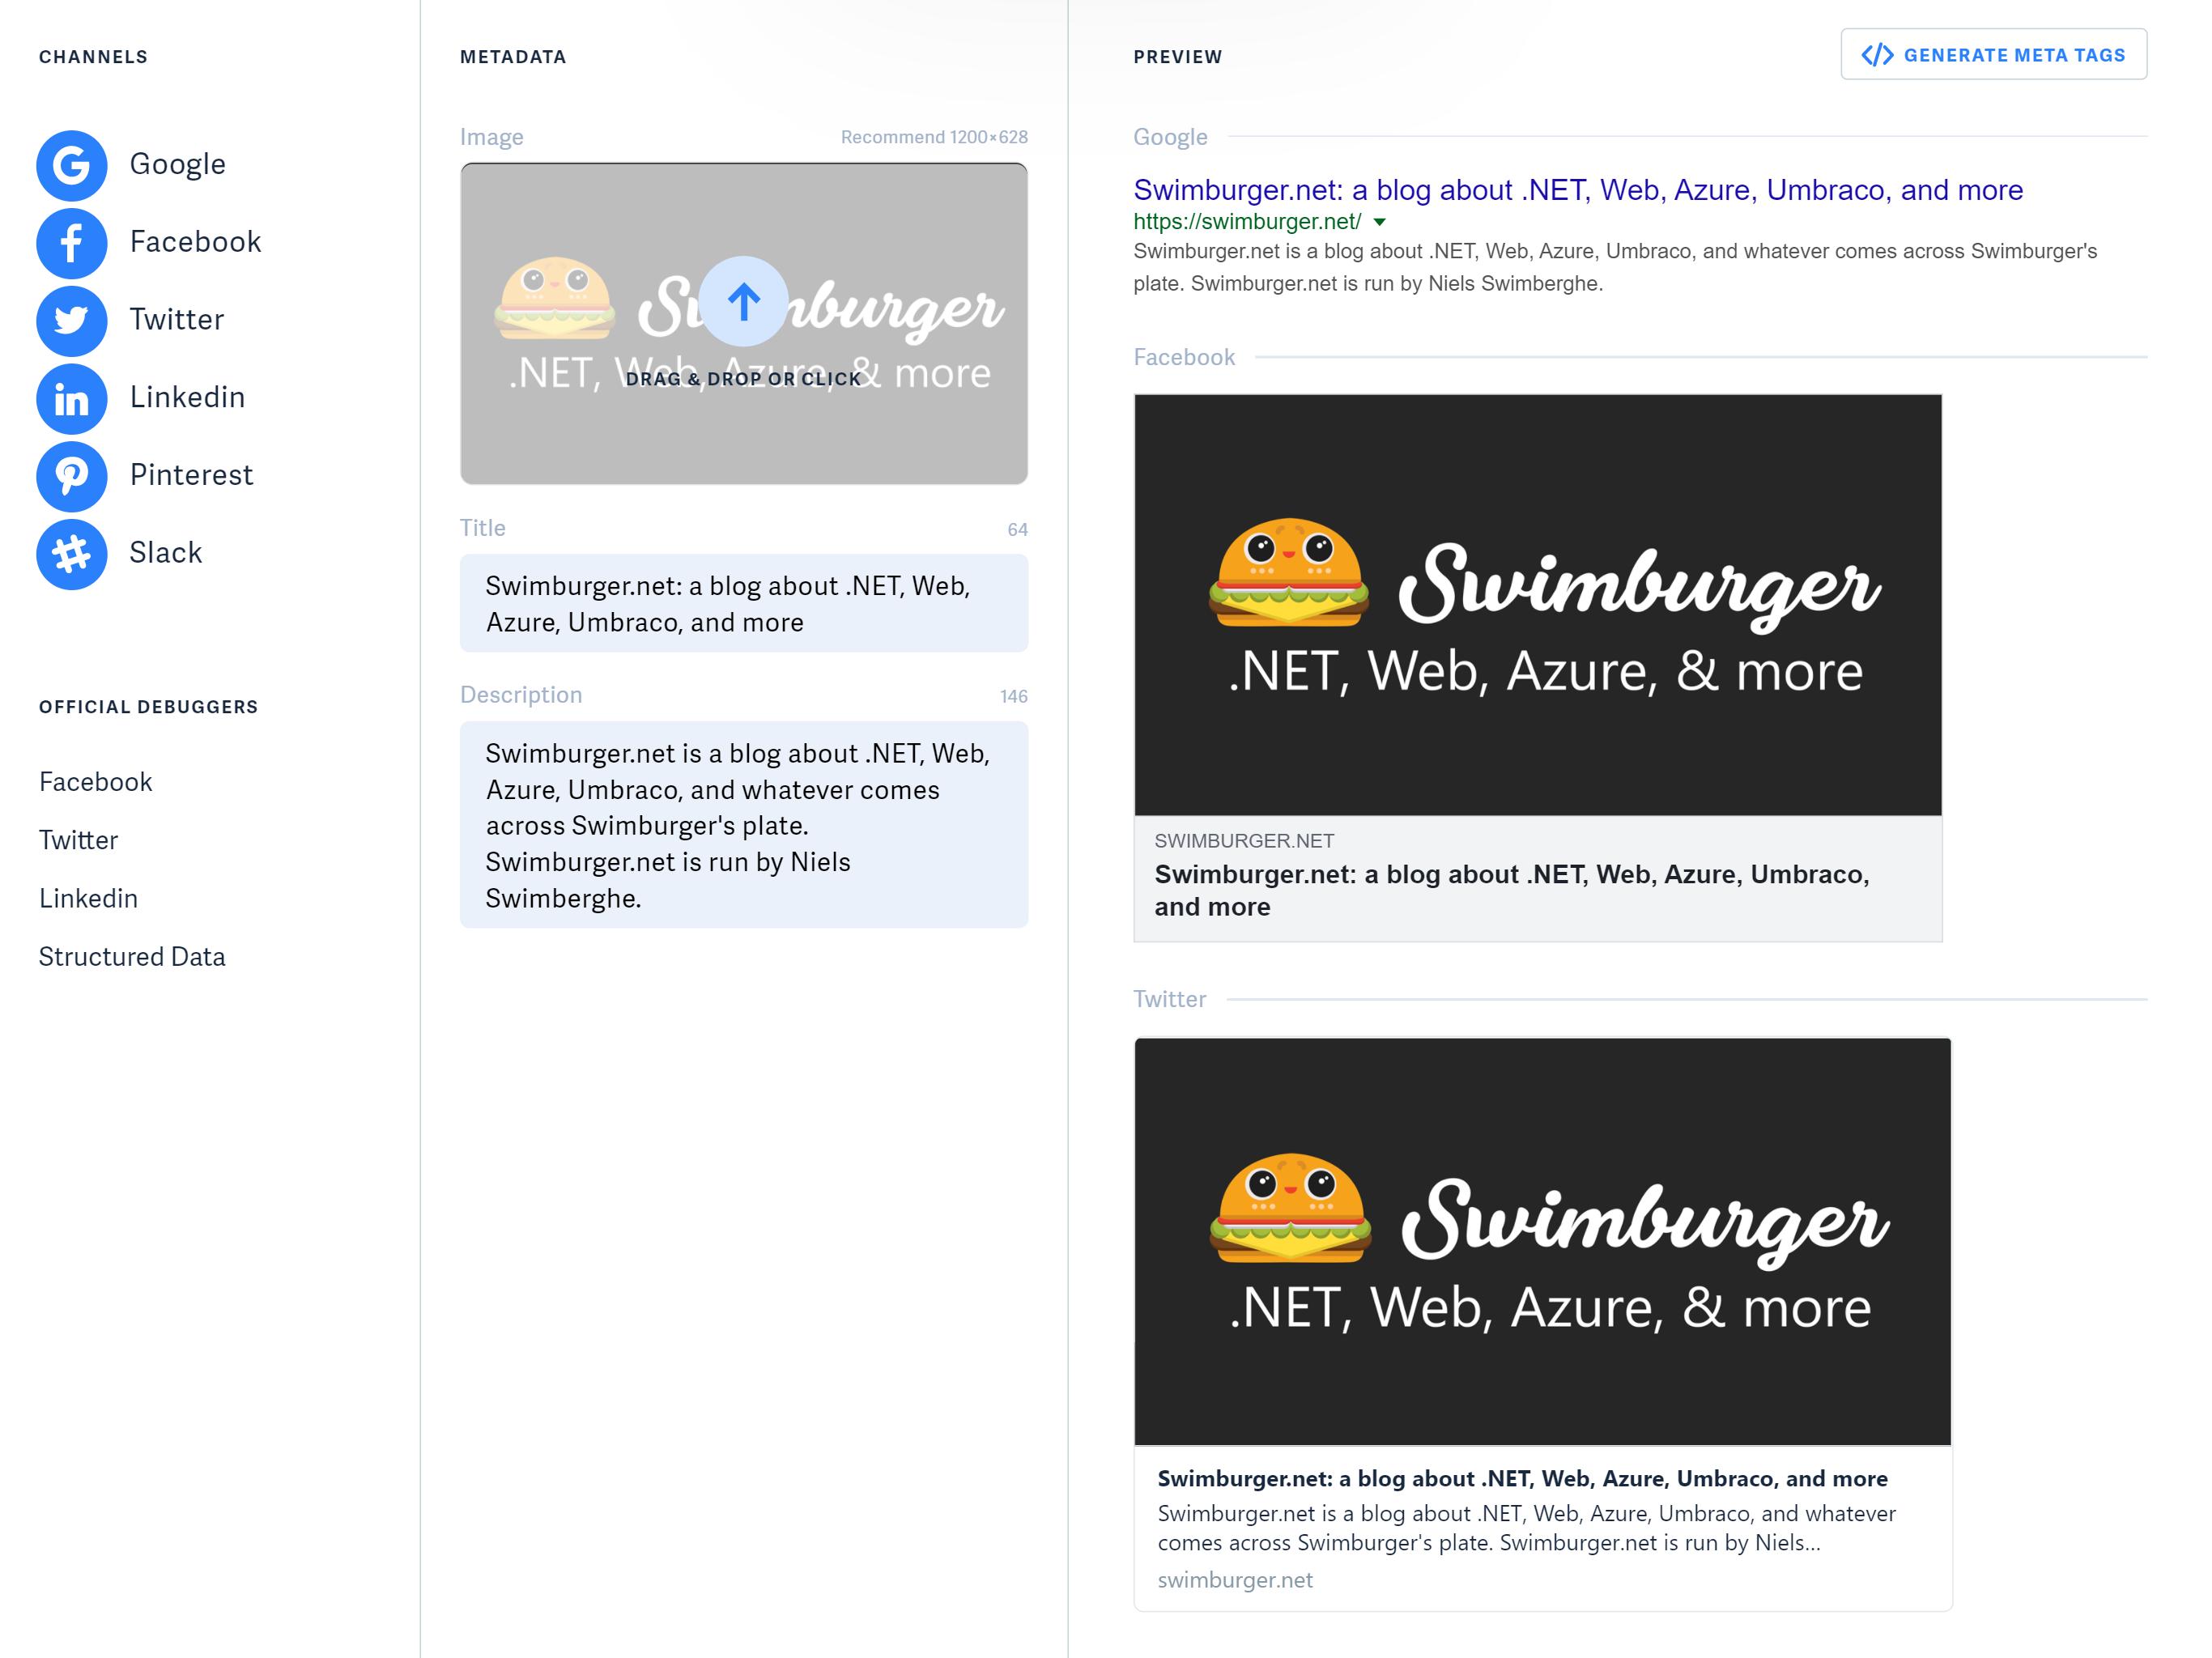 Screenshot of MetaTags.io for swimburger.net